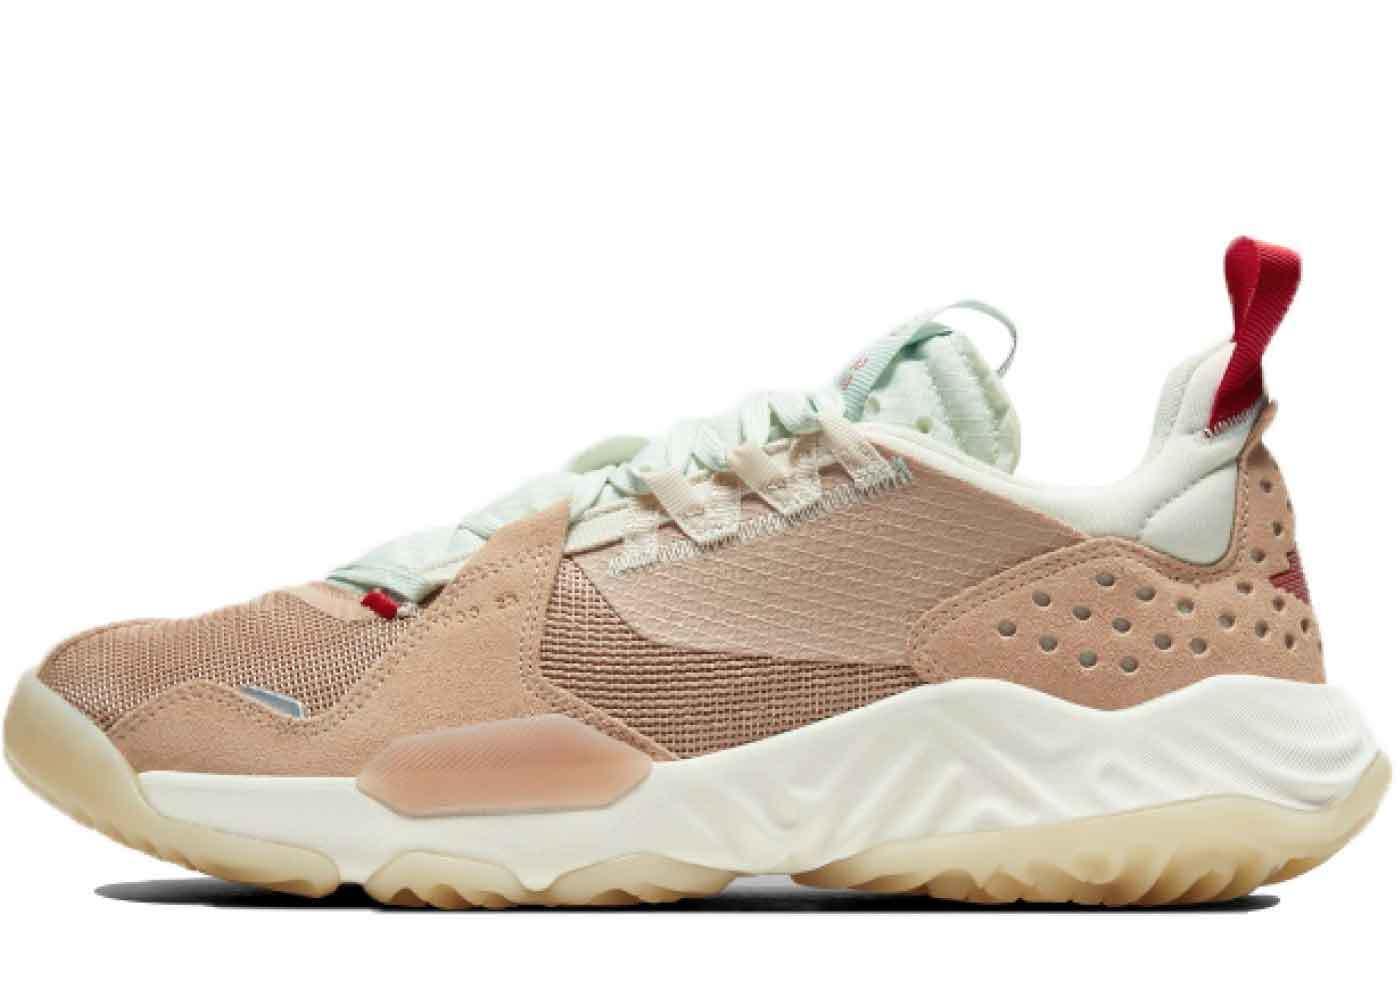 Nike Jordan Delta Vachetta Tan の写真